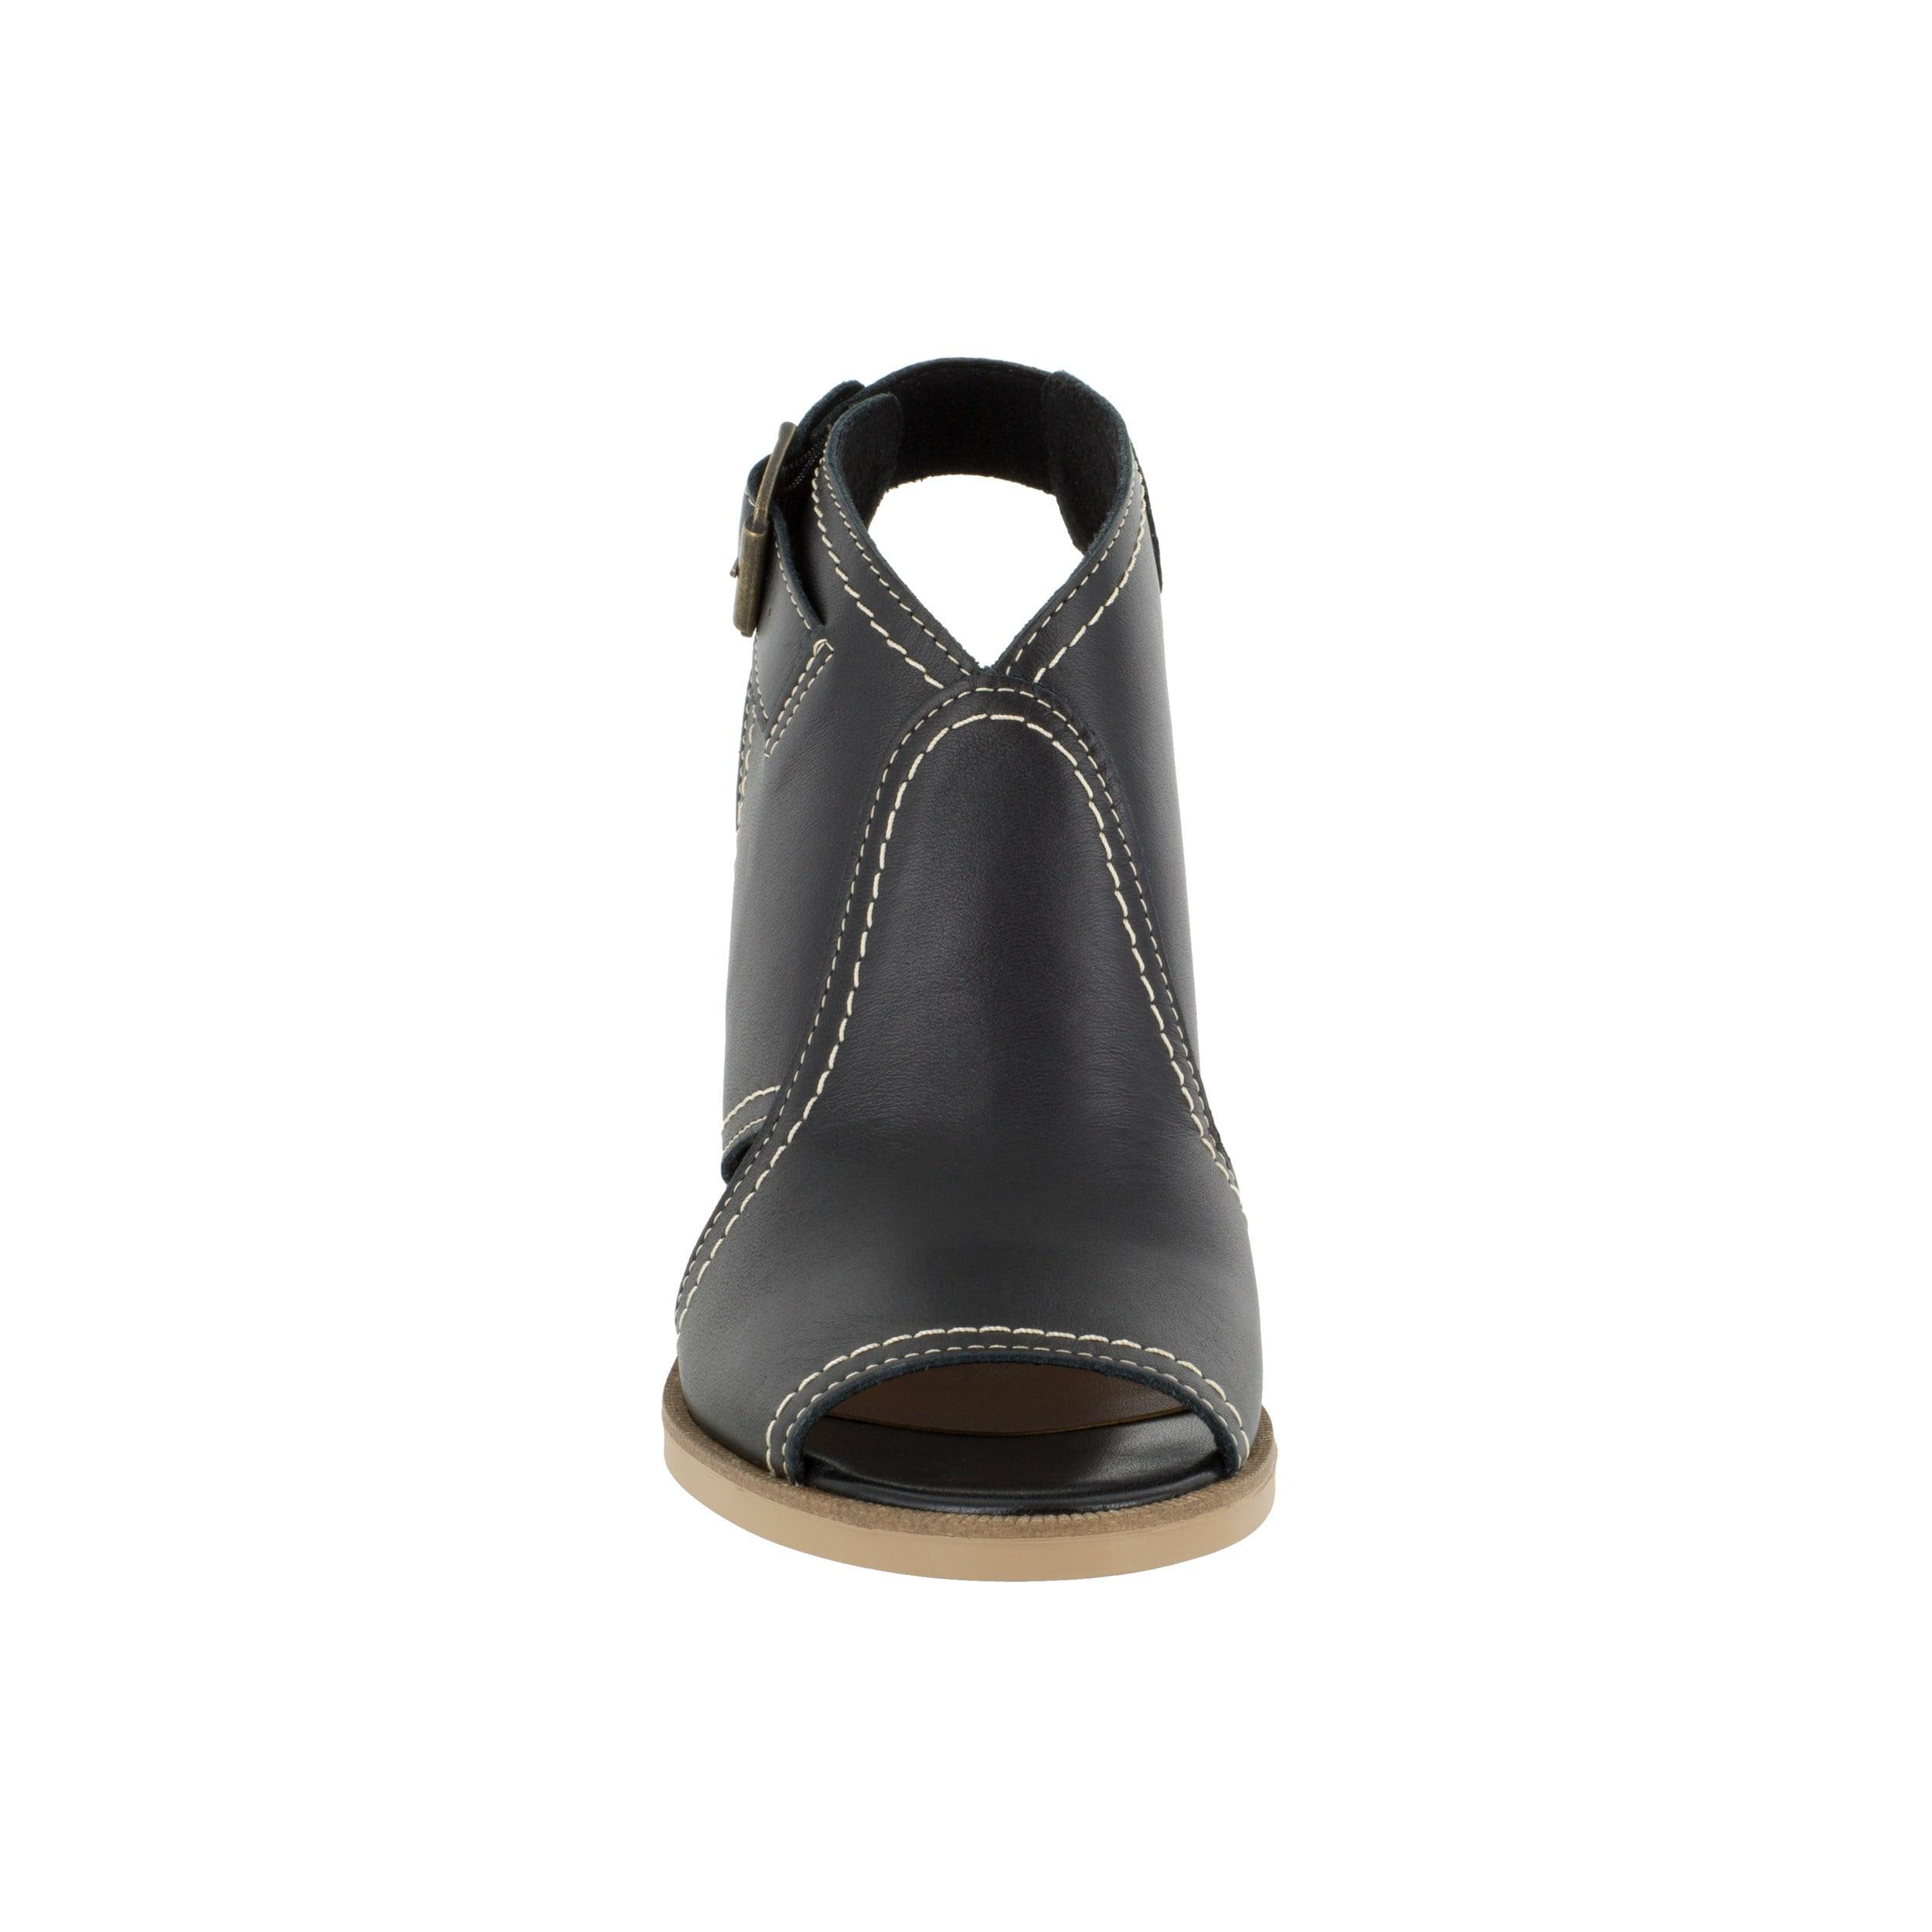 Bella Vita Women's Viv-Italy Black Italian Leather Shoes by Overstock